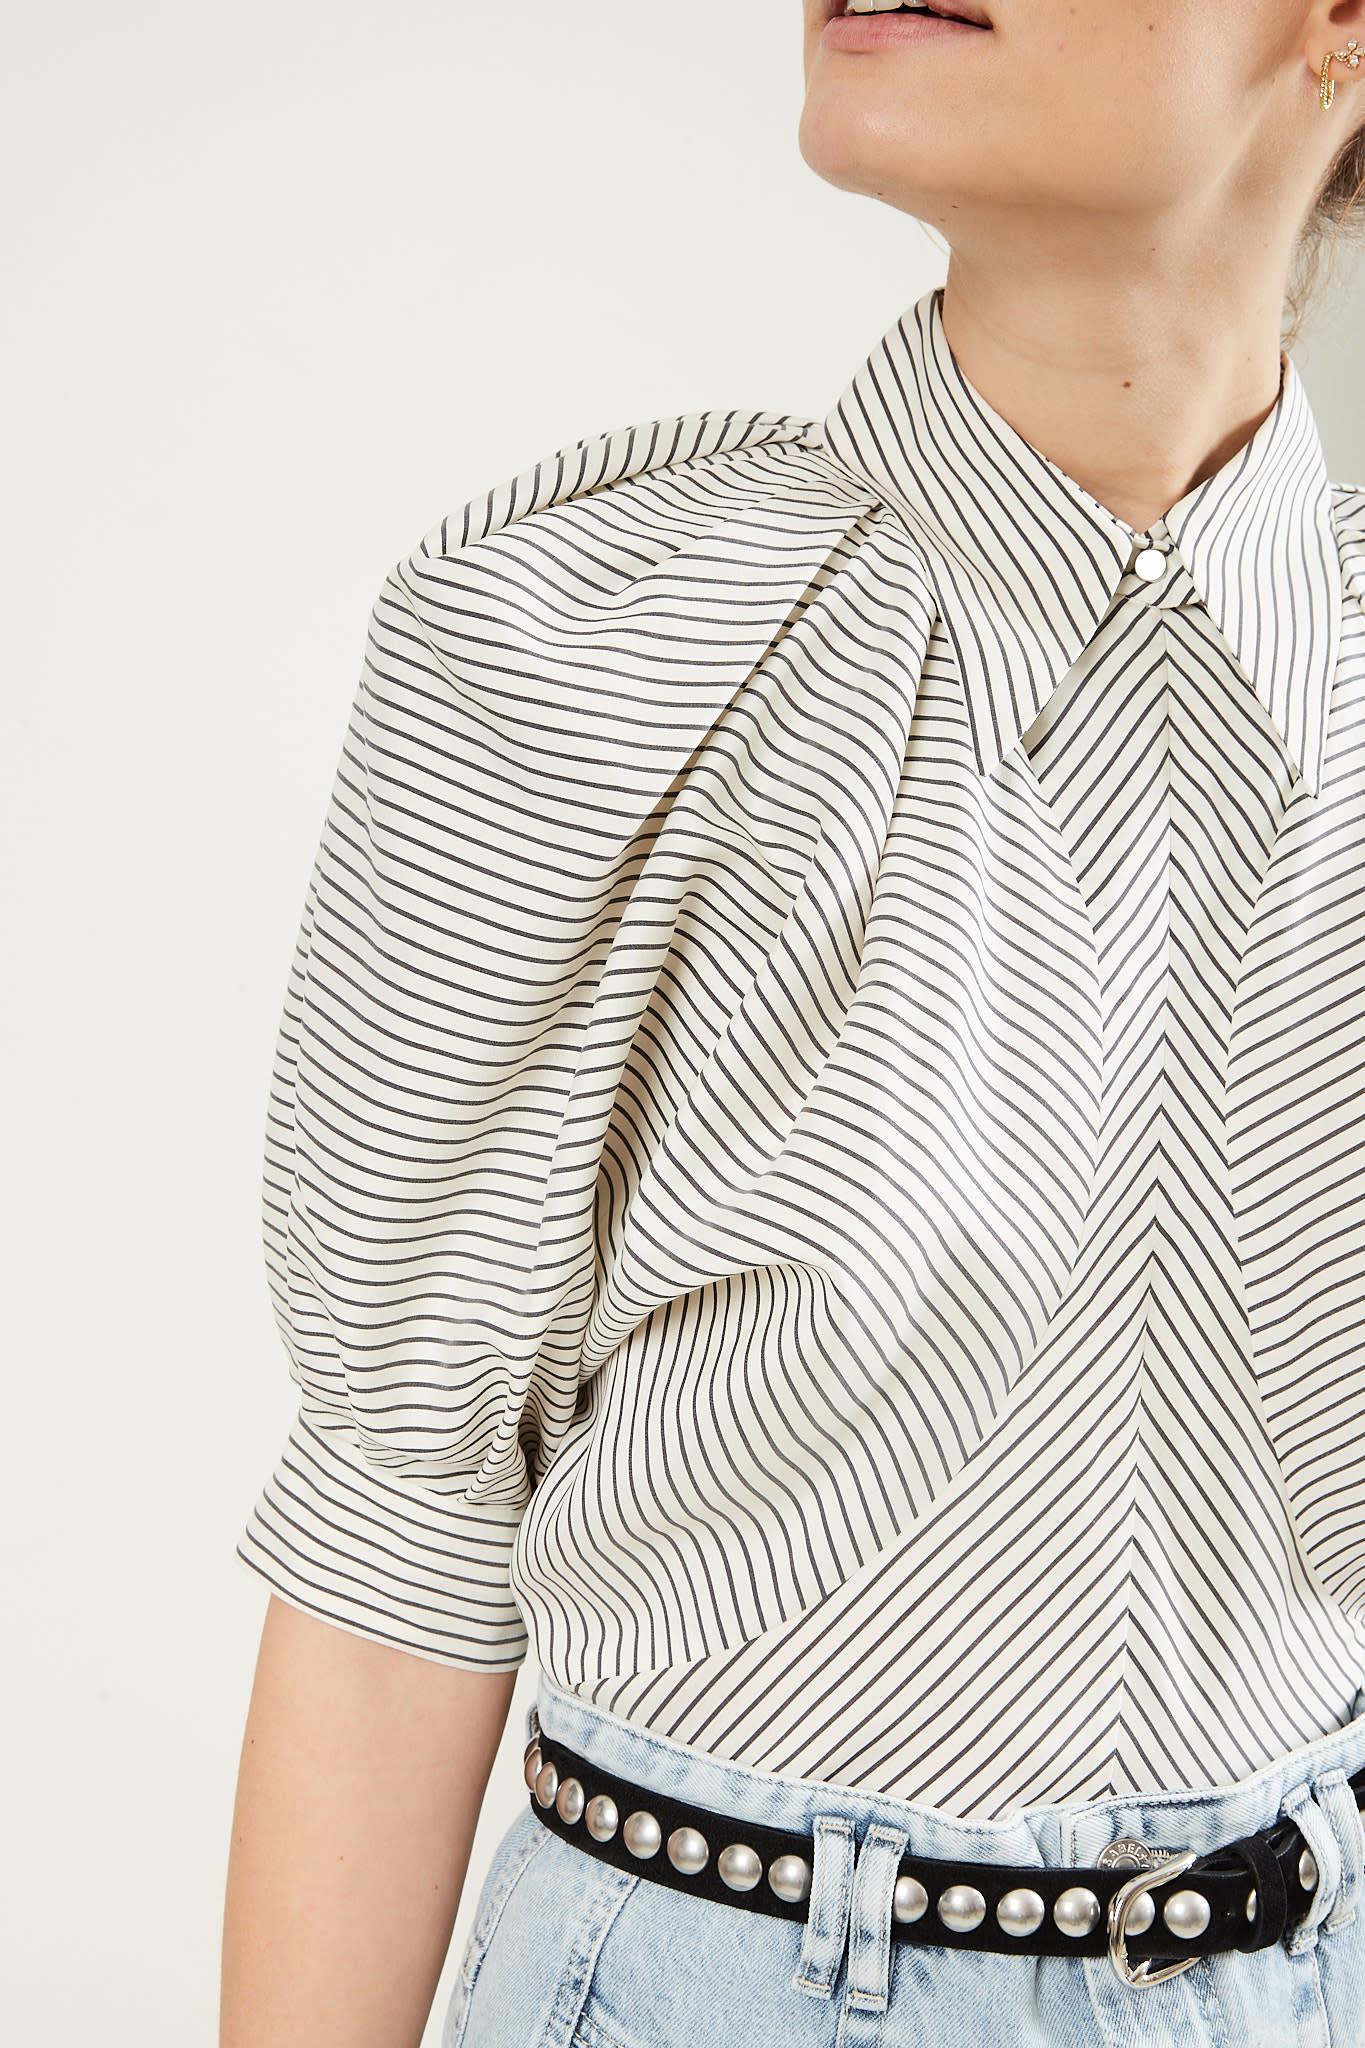 Isabel Marant - Eori striped silky top